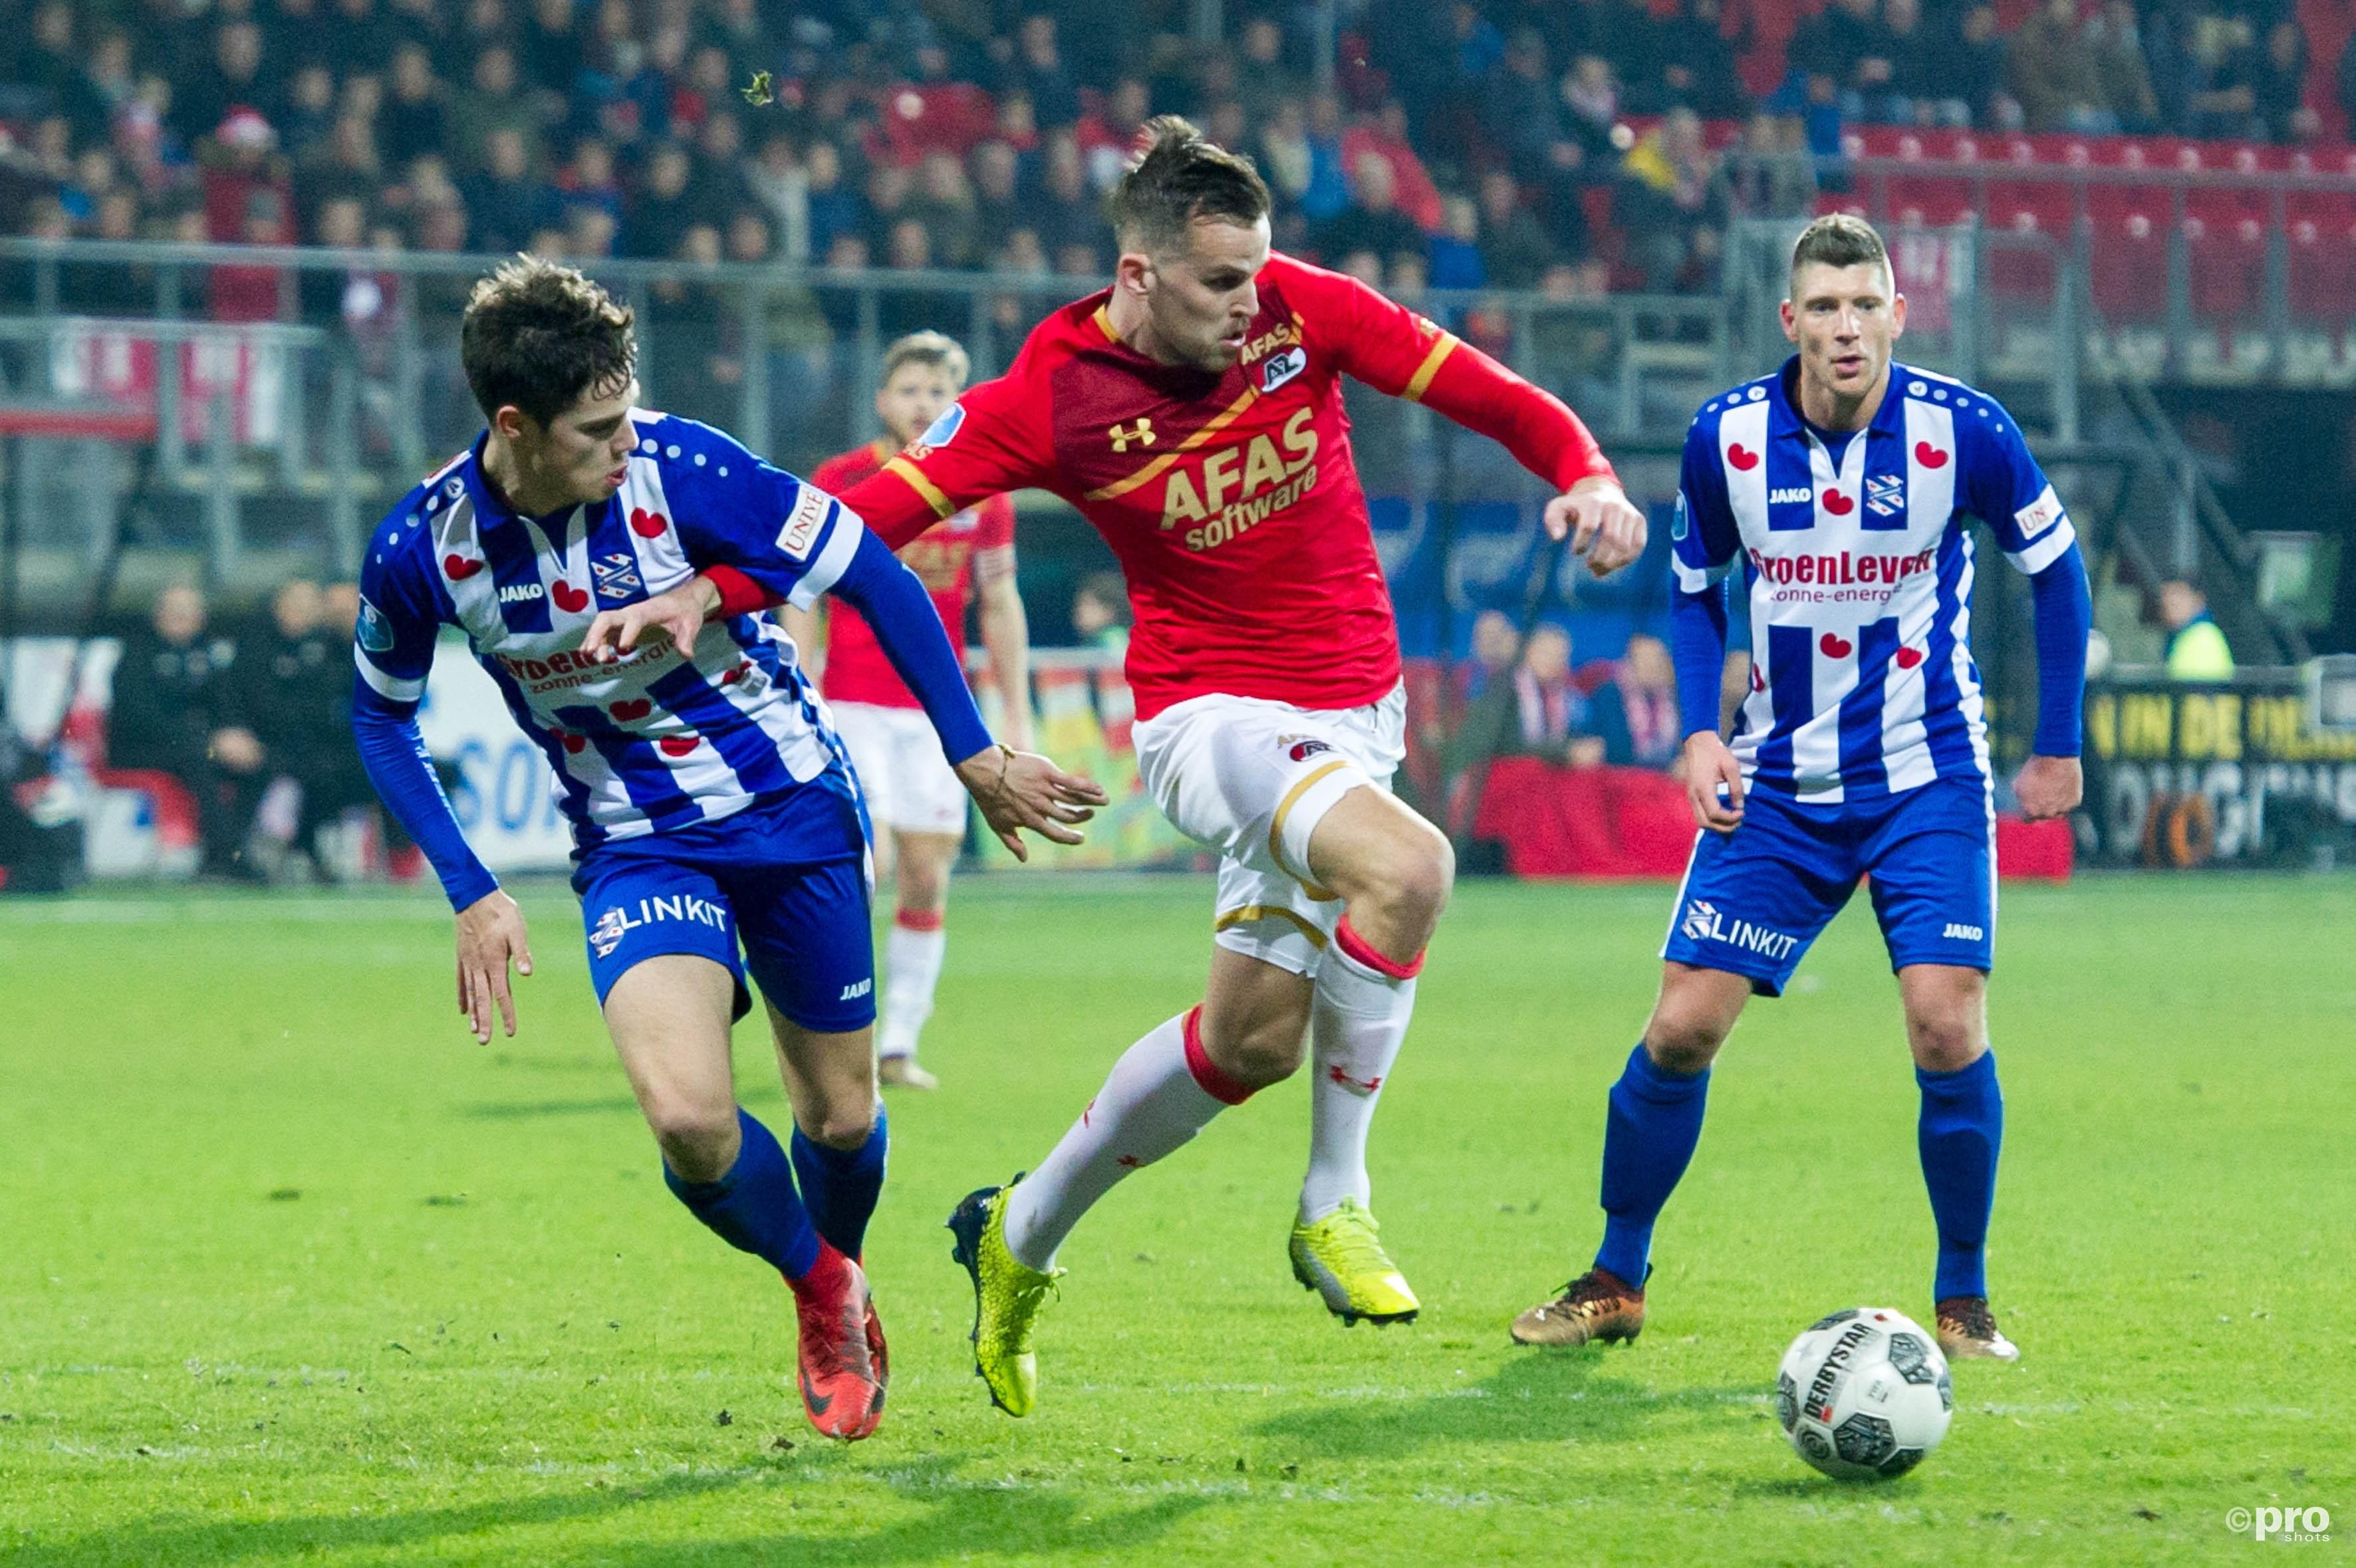 SC Heerenveen speler Kik Pierie en AZ speler Mats Seuntjens. (PRO SHOTS/Martijn Buskermolen)